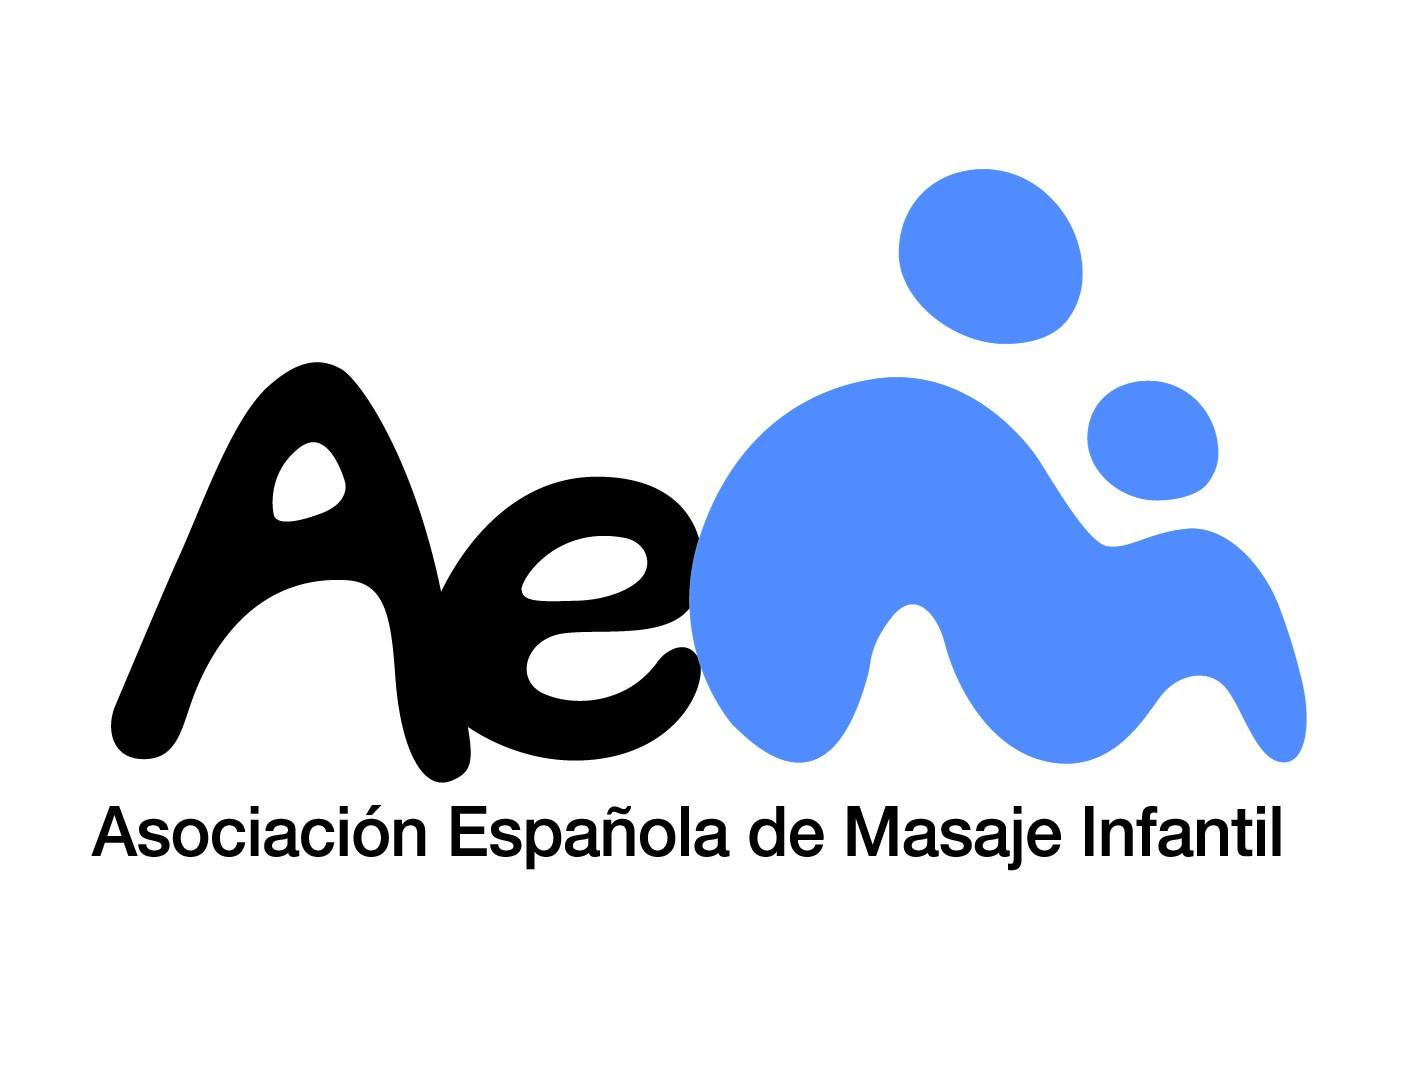 ASOCIACIÓN ESPAÑOLA DE MASAJE INFANTIL